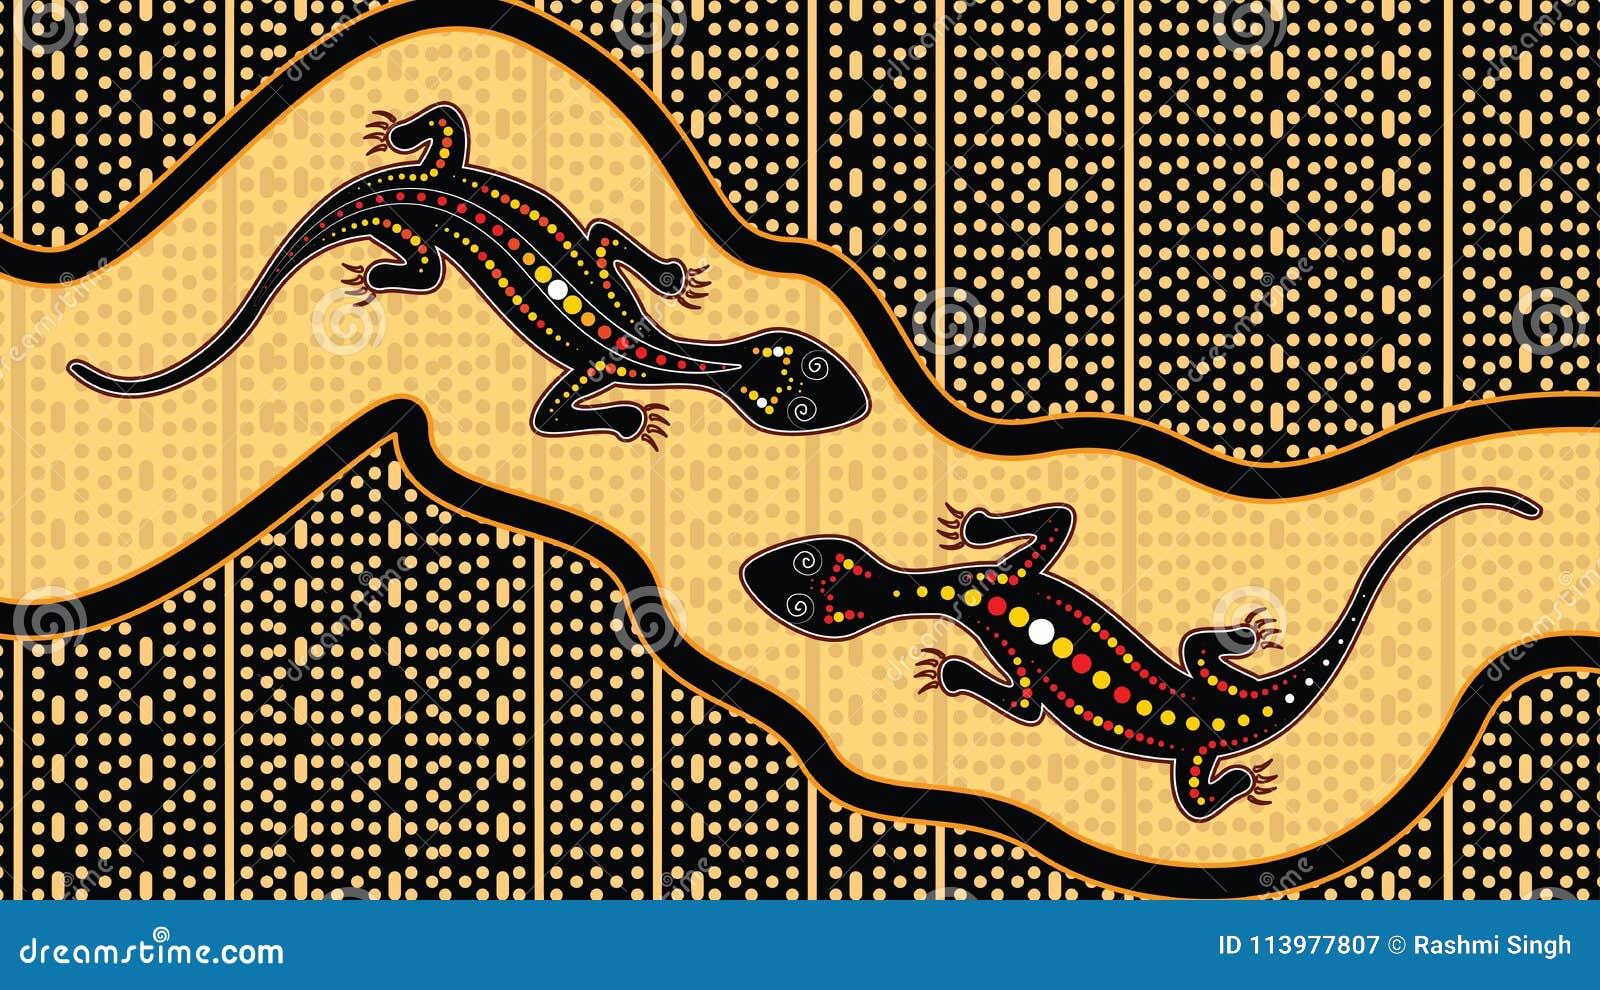 Lizard Vector Aboriginal Art Background With Lizard Landscape